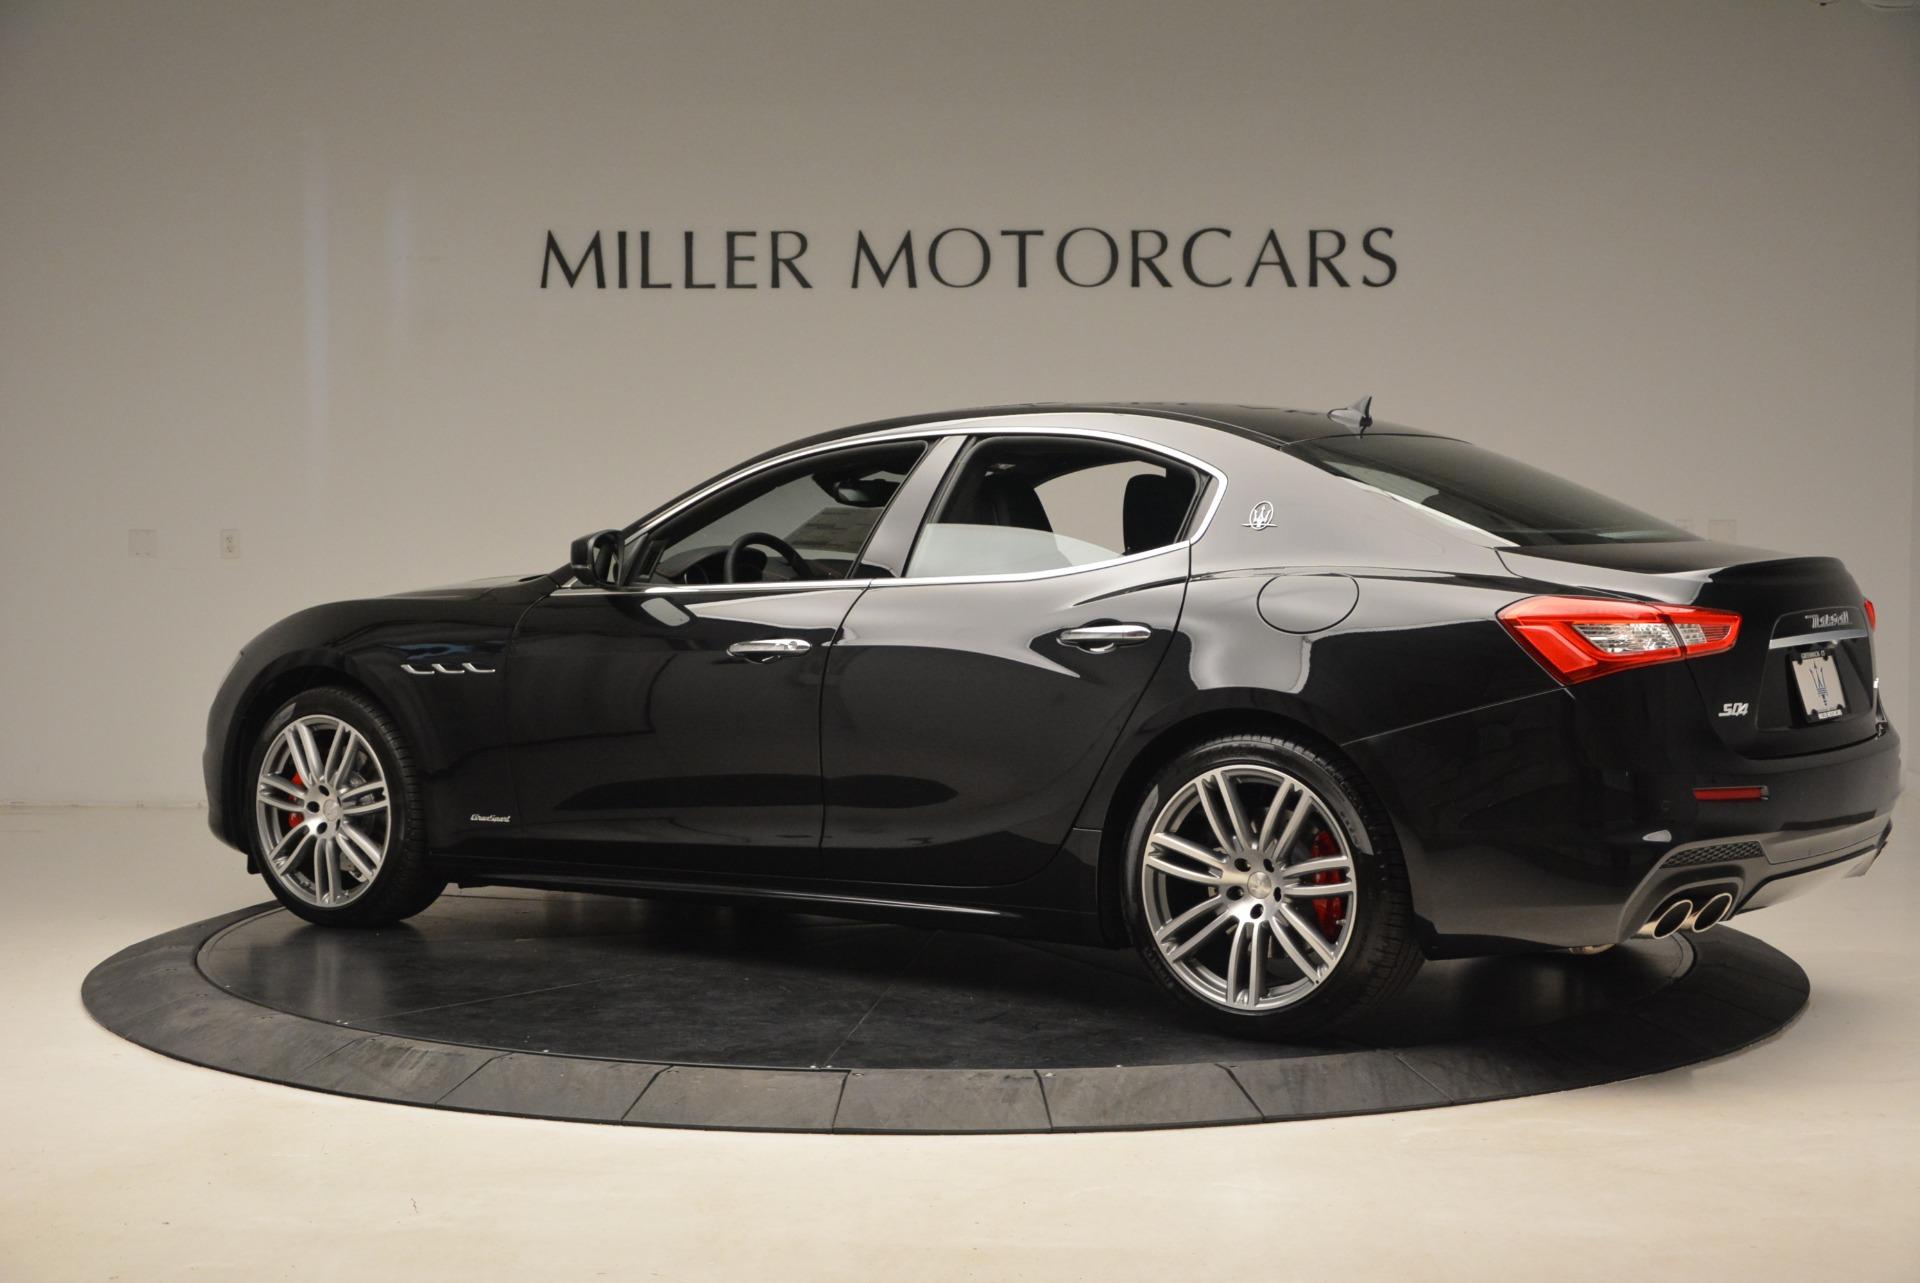 New 2019 Maserati Ghibli S Q4 GranSport For Sale In Greenwich, CT 2615_p4